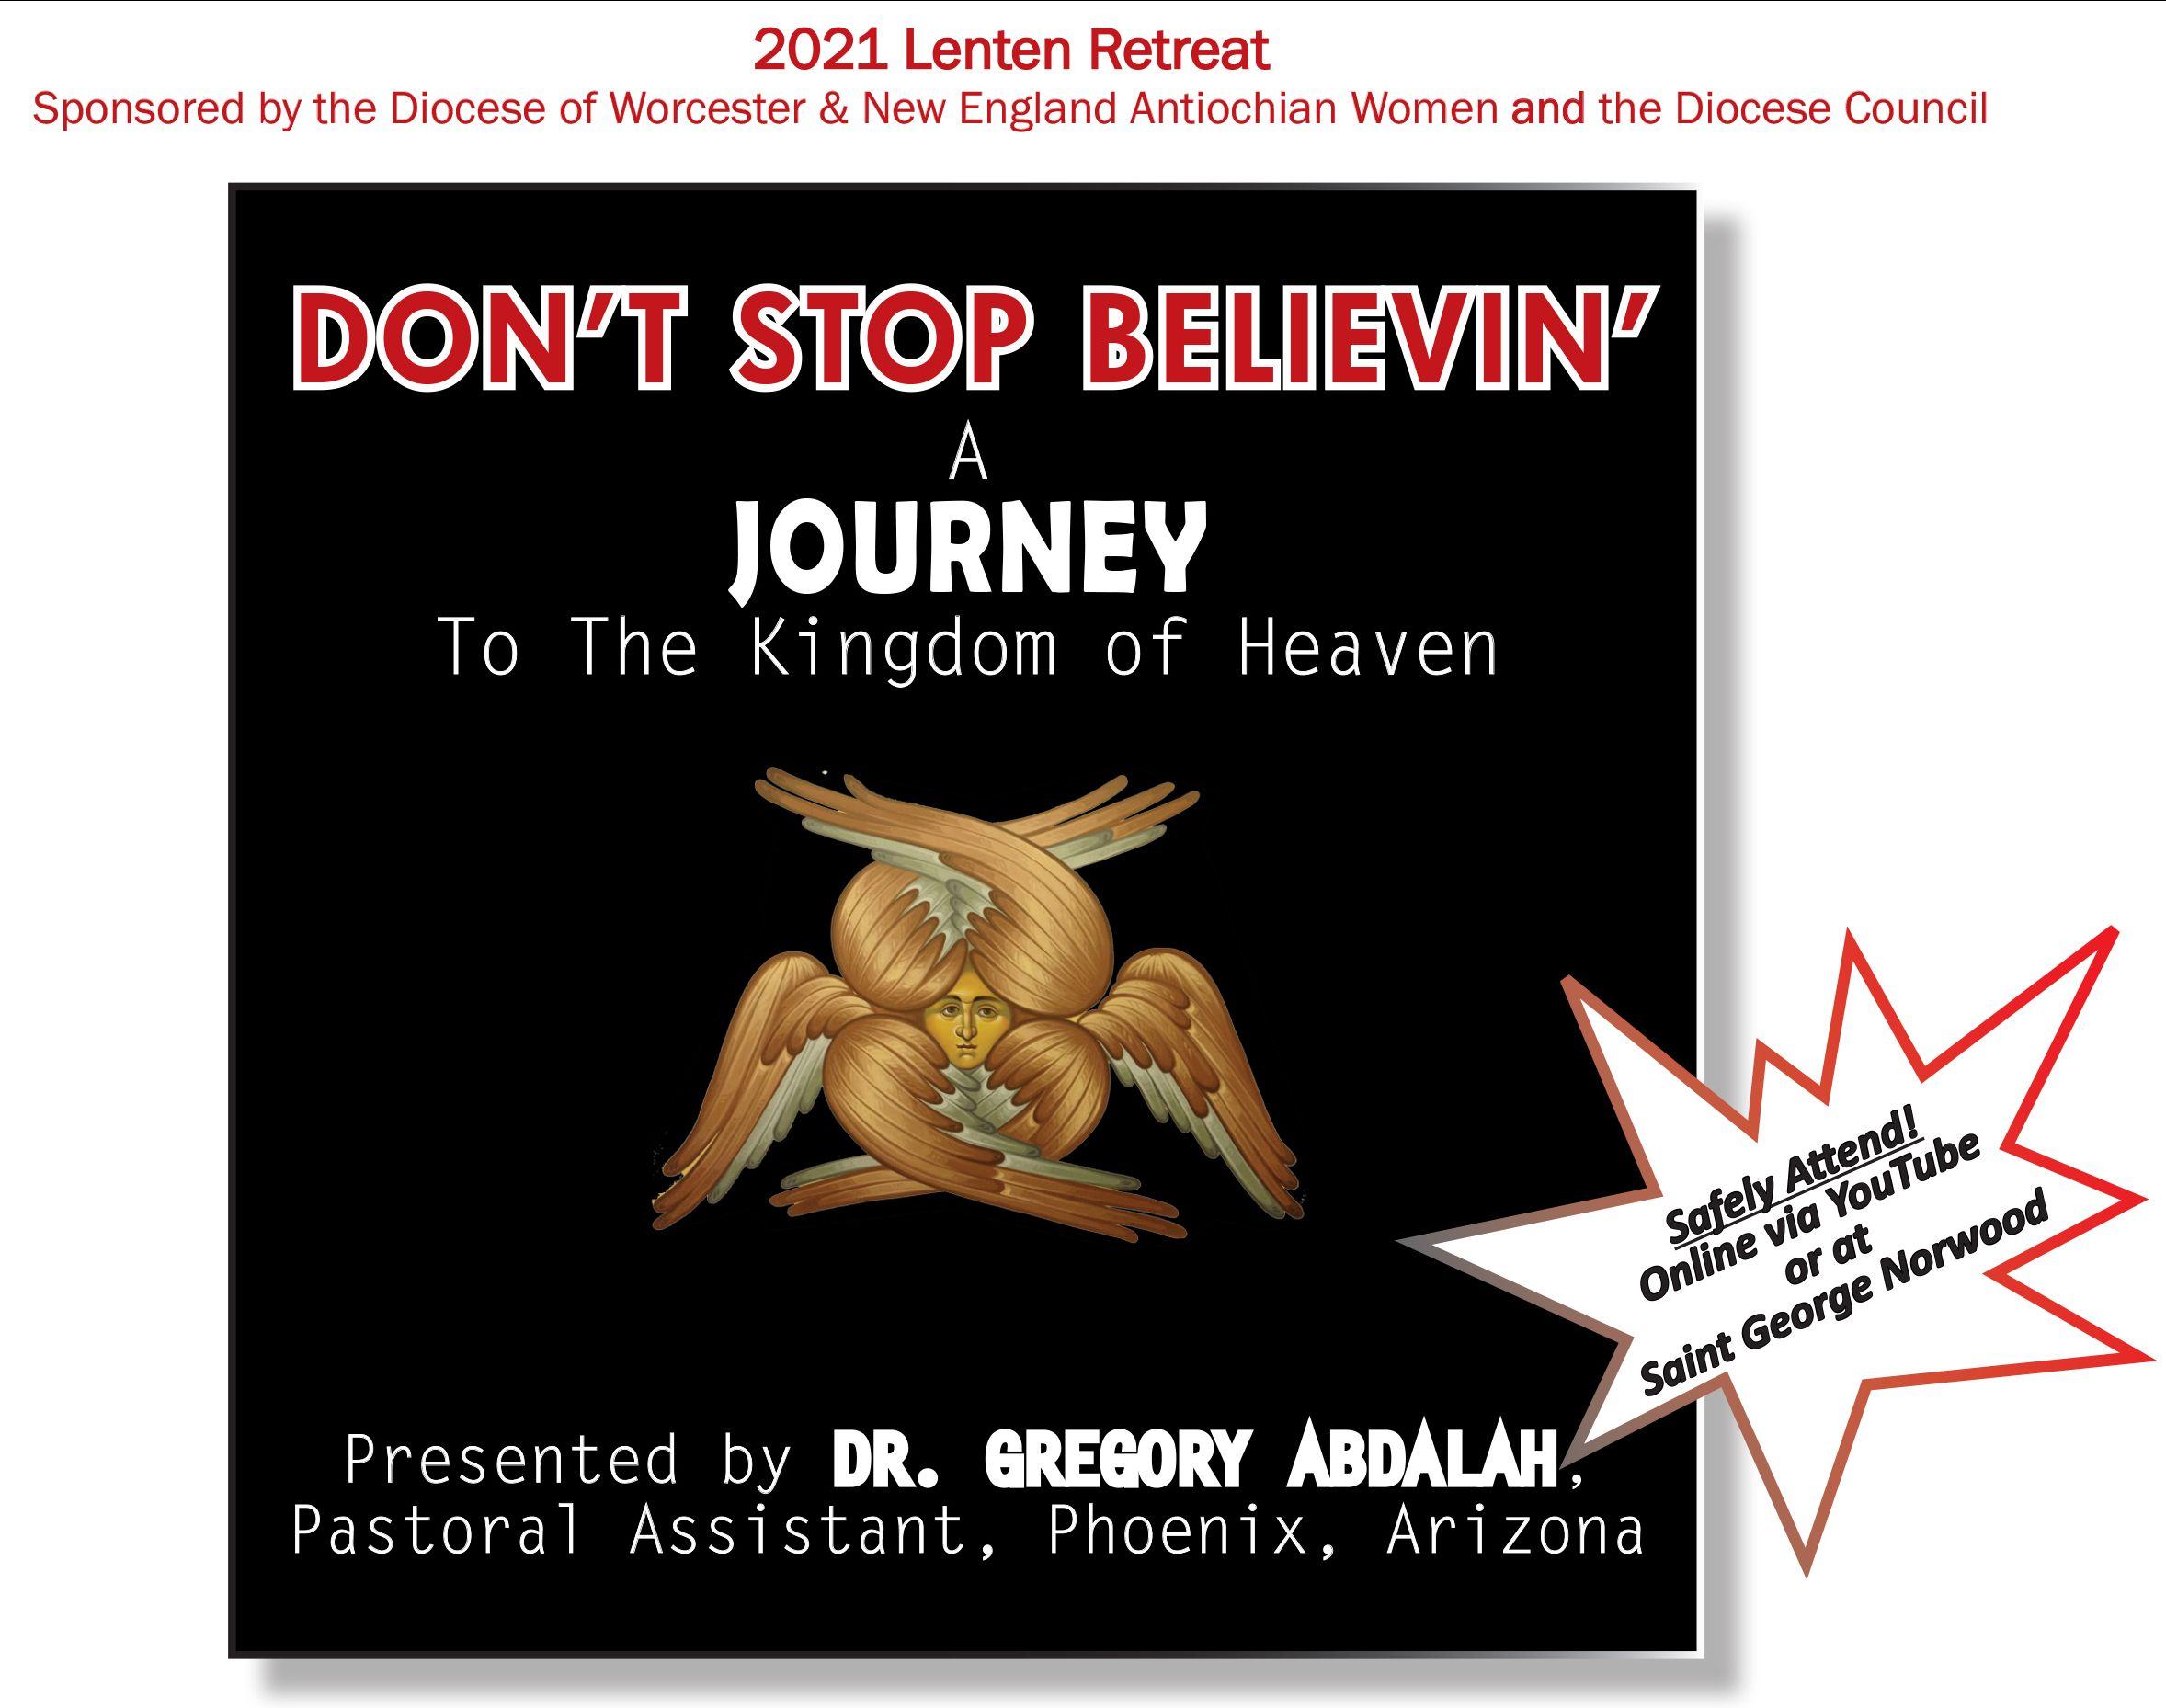 2021 Diocese Lenten Retreat